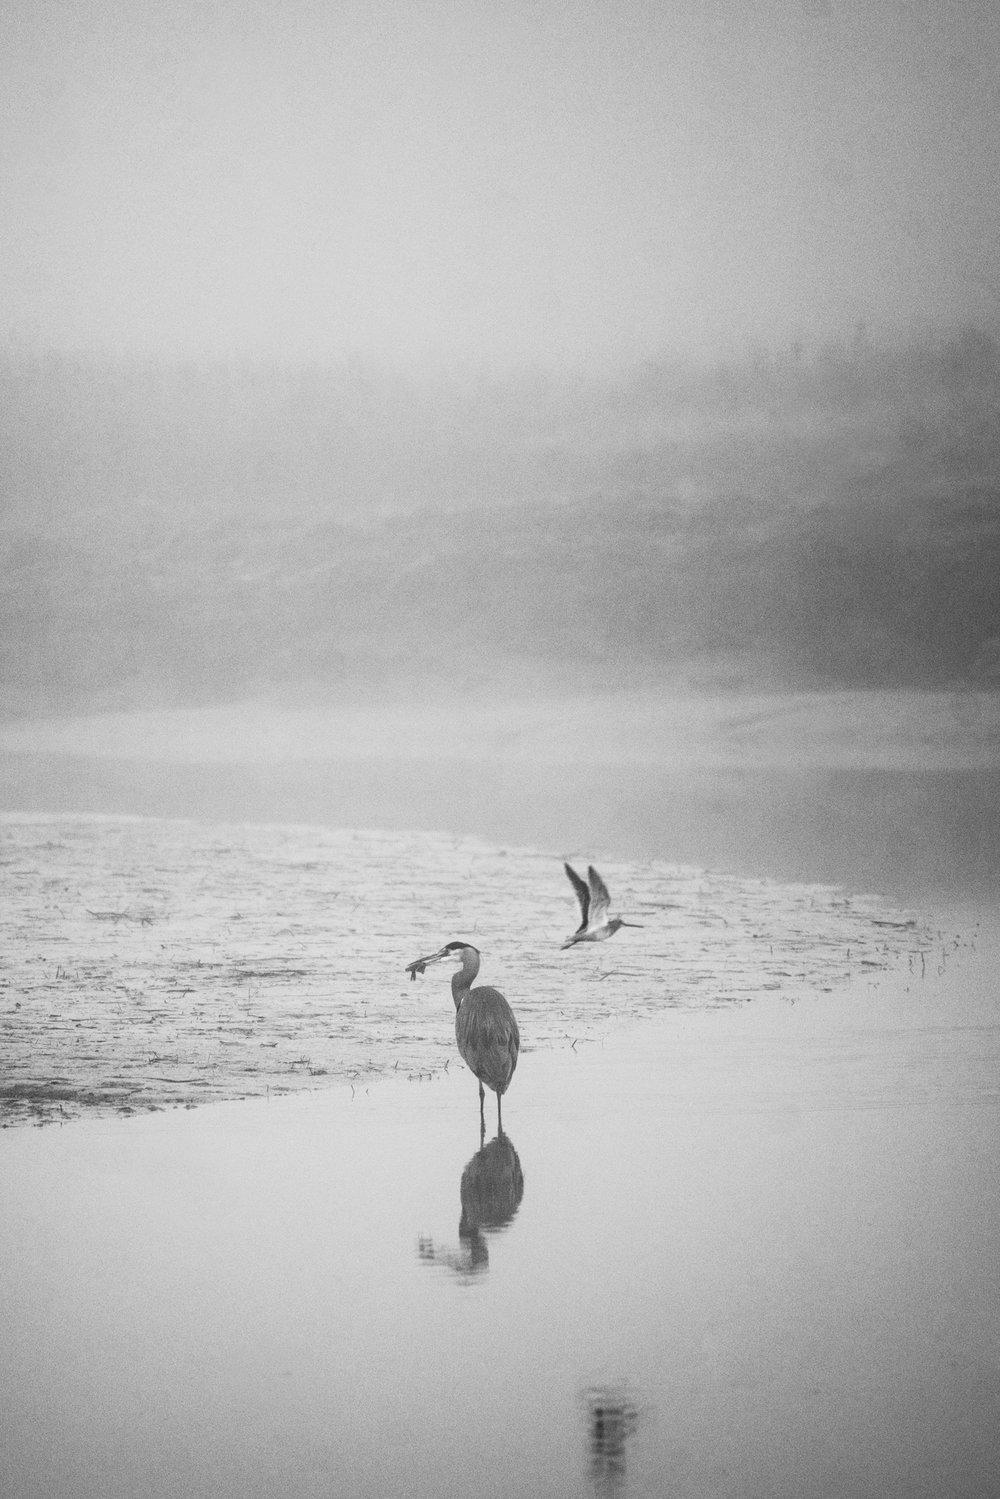 Wildlife Photographer in the Pacific Northwest